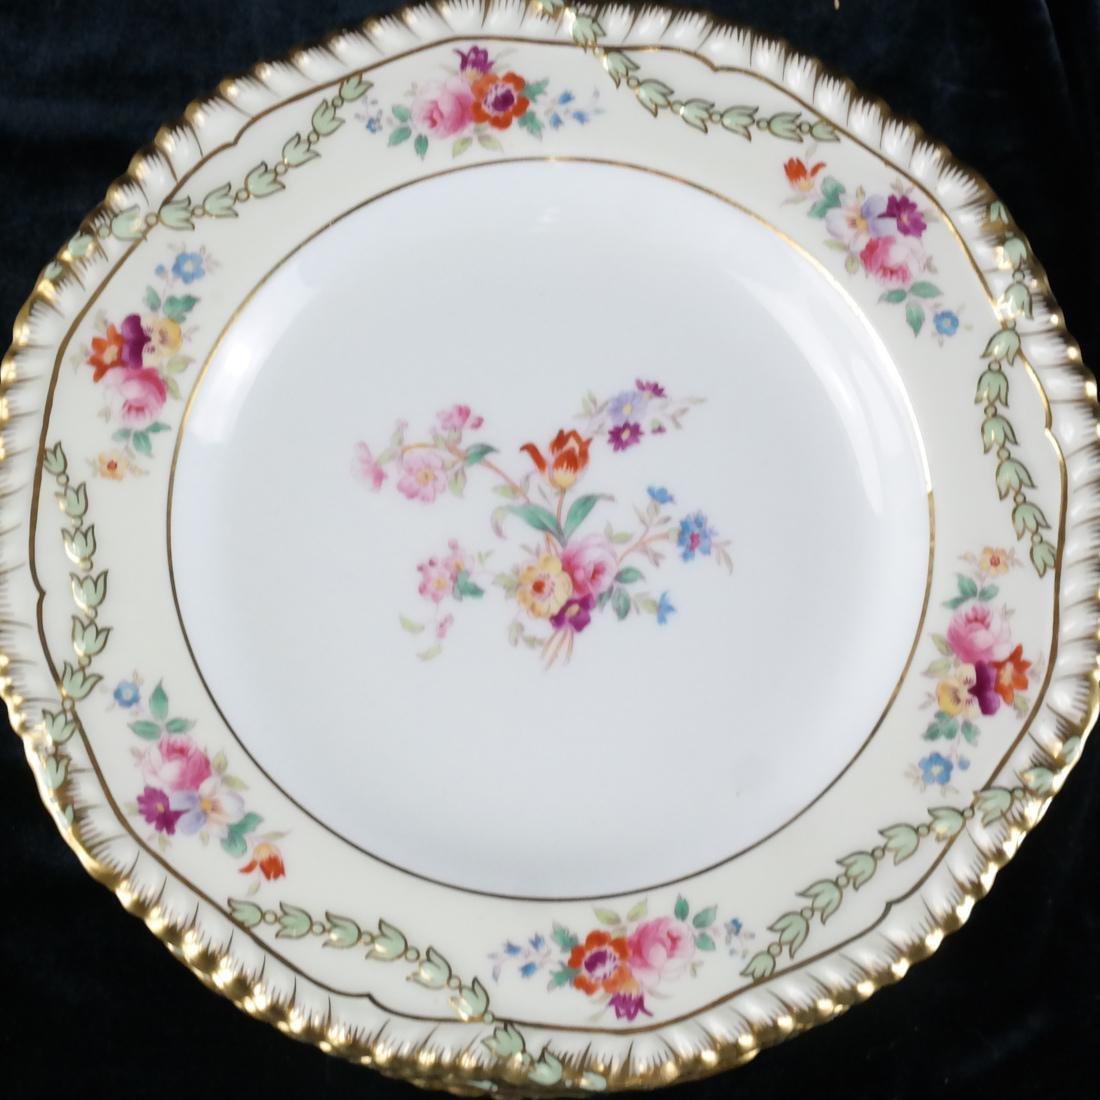 12 Wedgwood Porcelain Luncheon Plates - 2